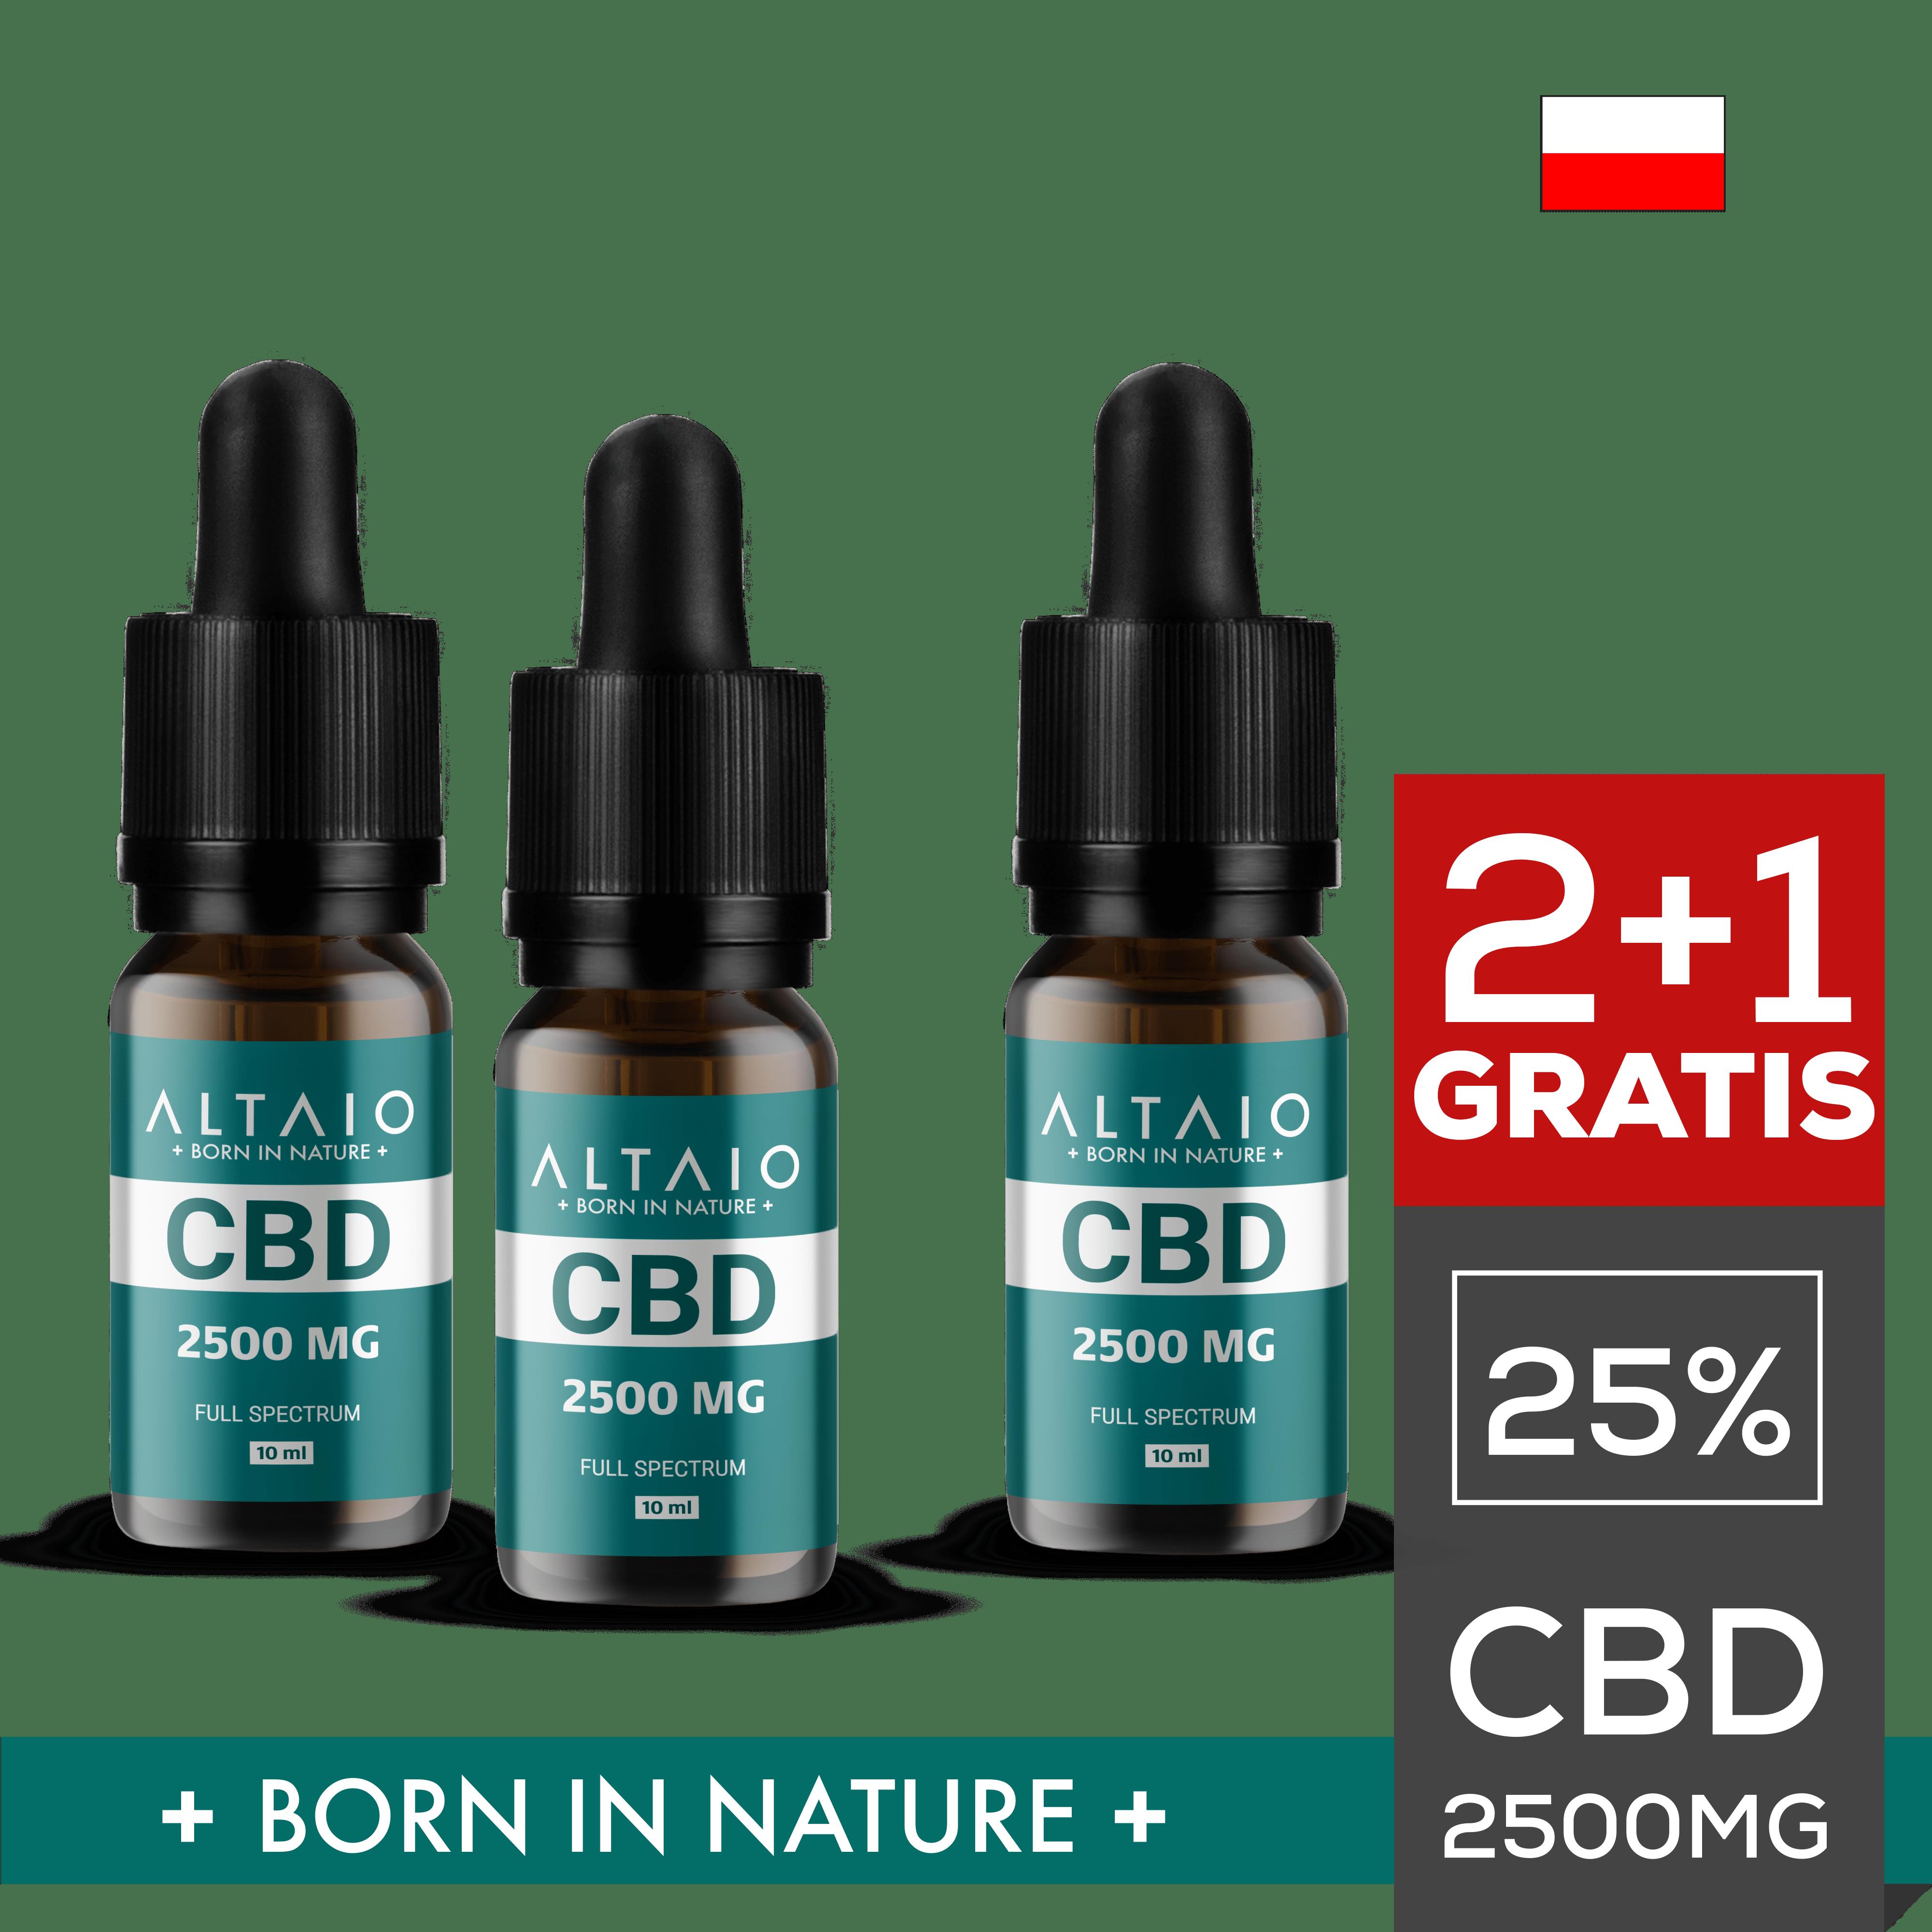 ZESTAW 2+1 GRATIS ALTAIO olejek konopny CBD 2500 mg 10 ml